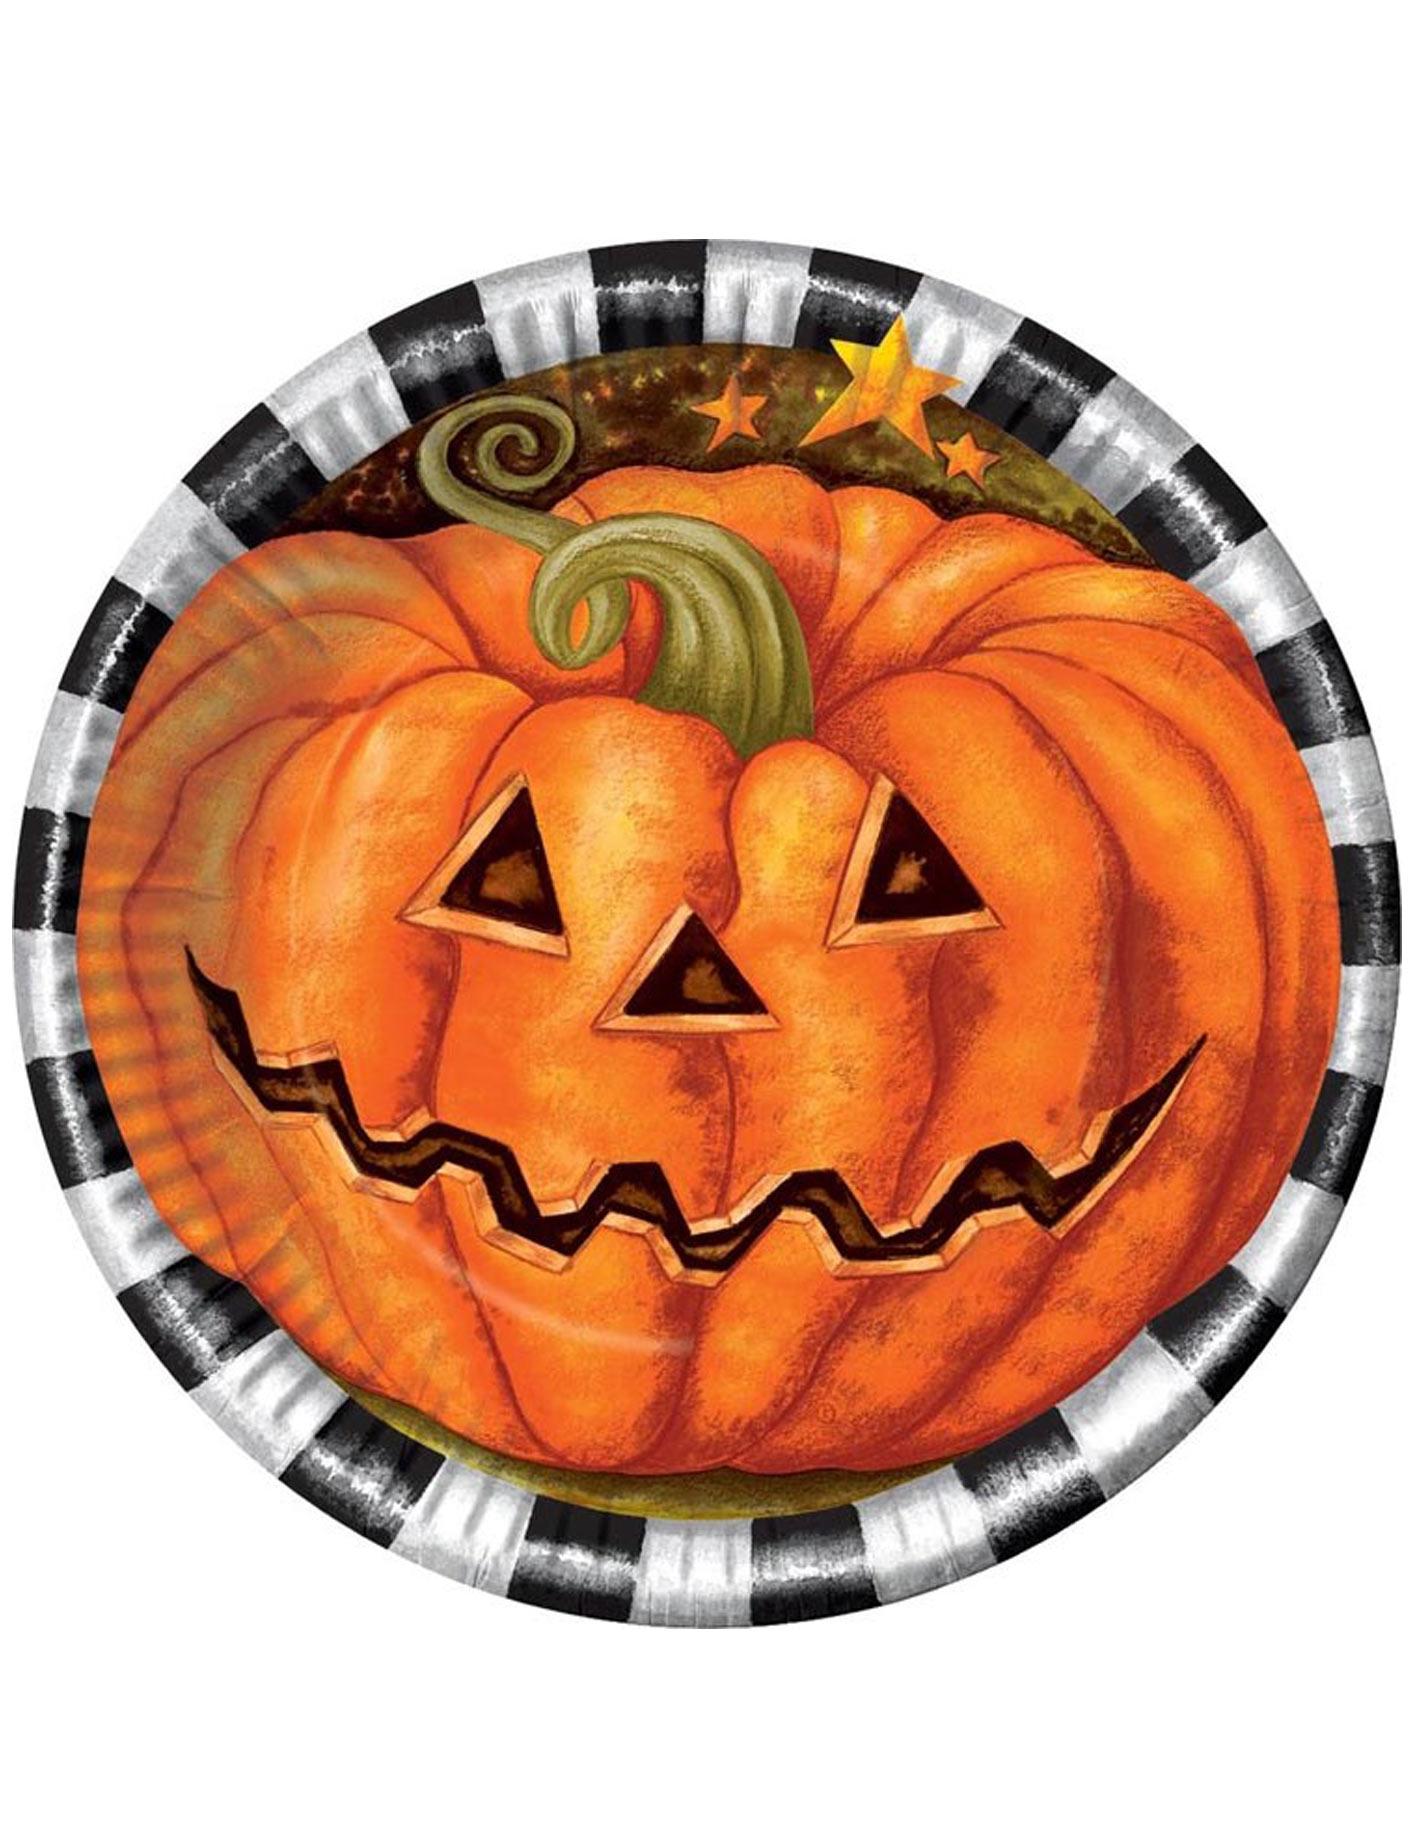 304196 B Halloween deko außen ~ Halloween Kürbis Teller Partydeko ...